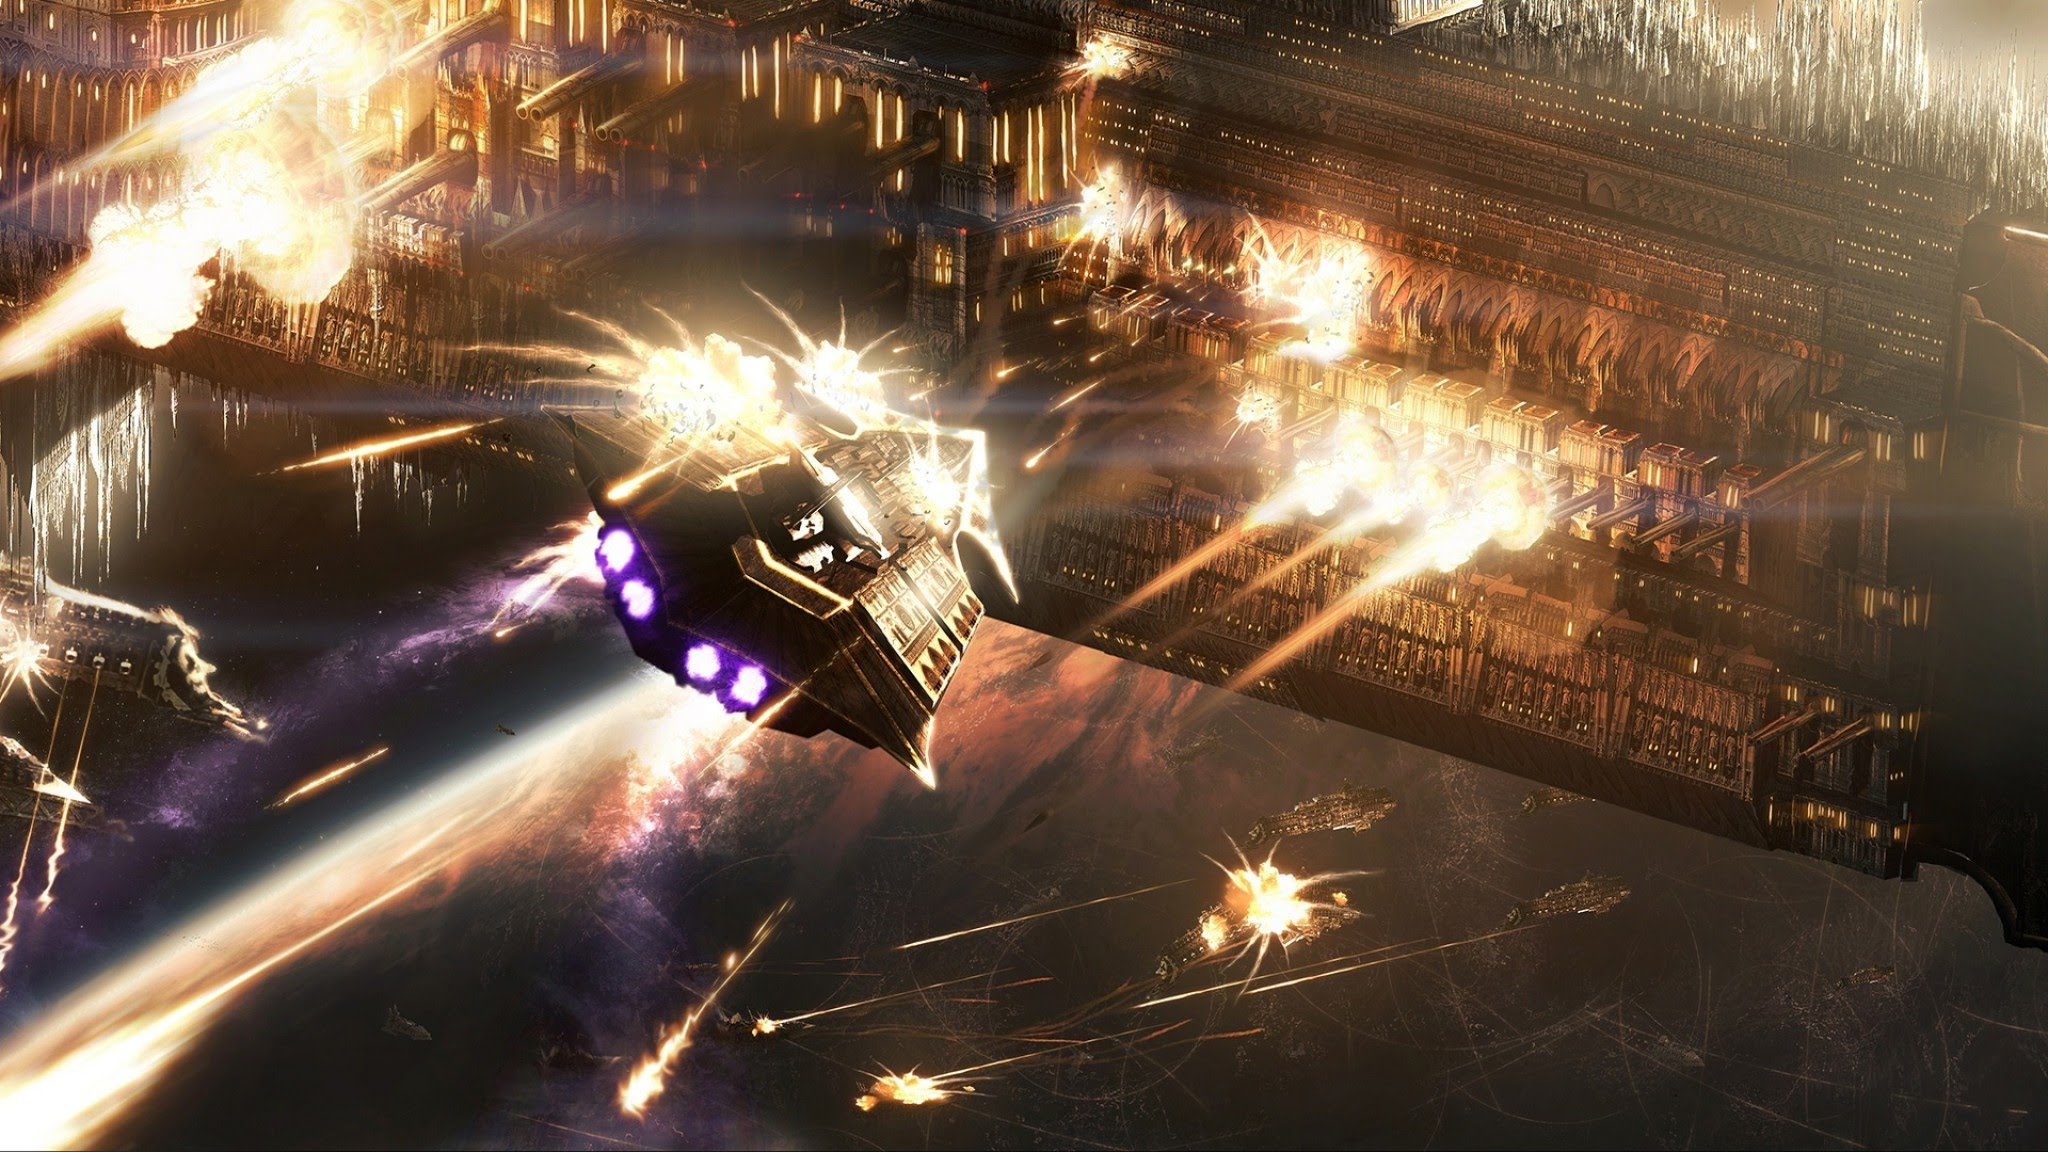 Battlefleet Gothic: Armada Desktop wallpaper